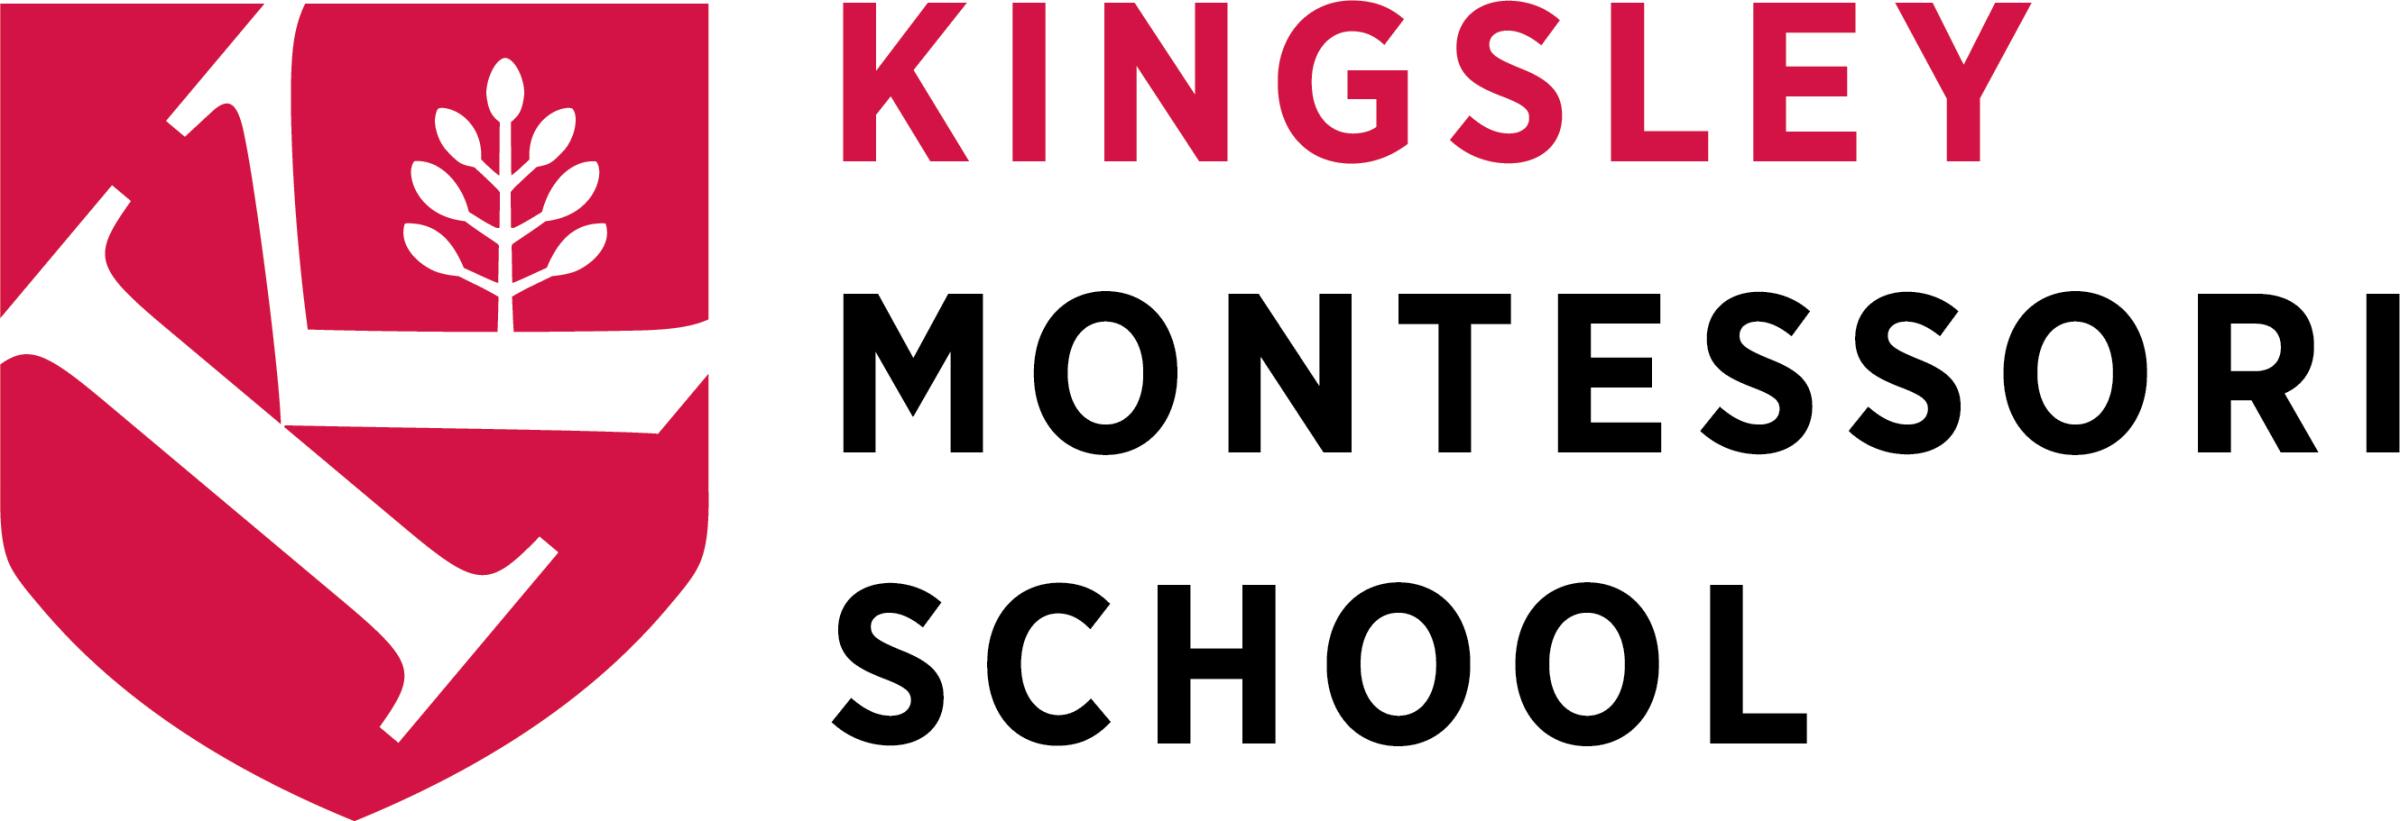 Kingsley Montessori School